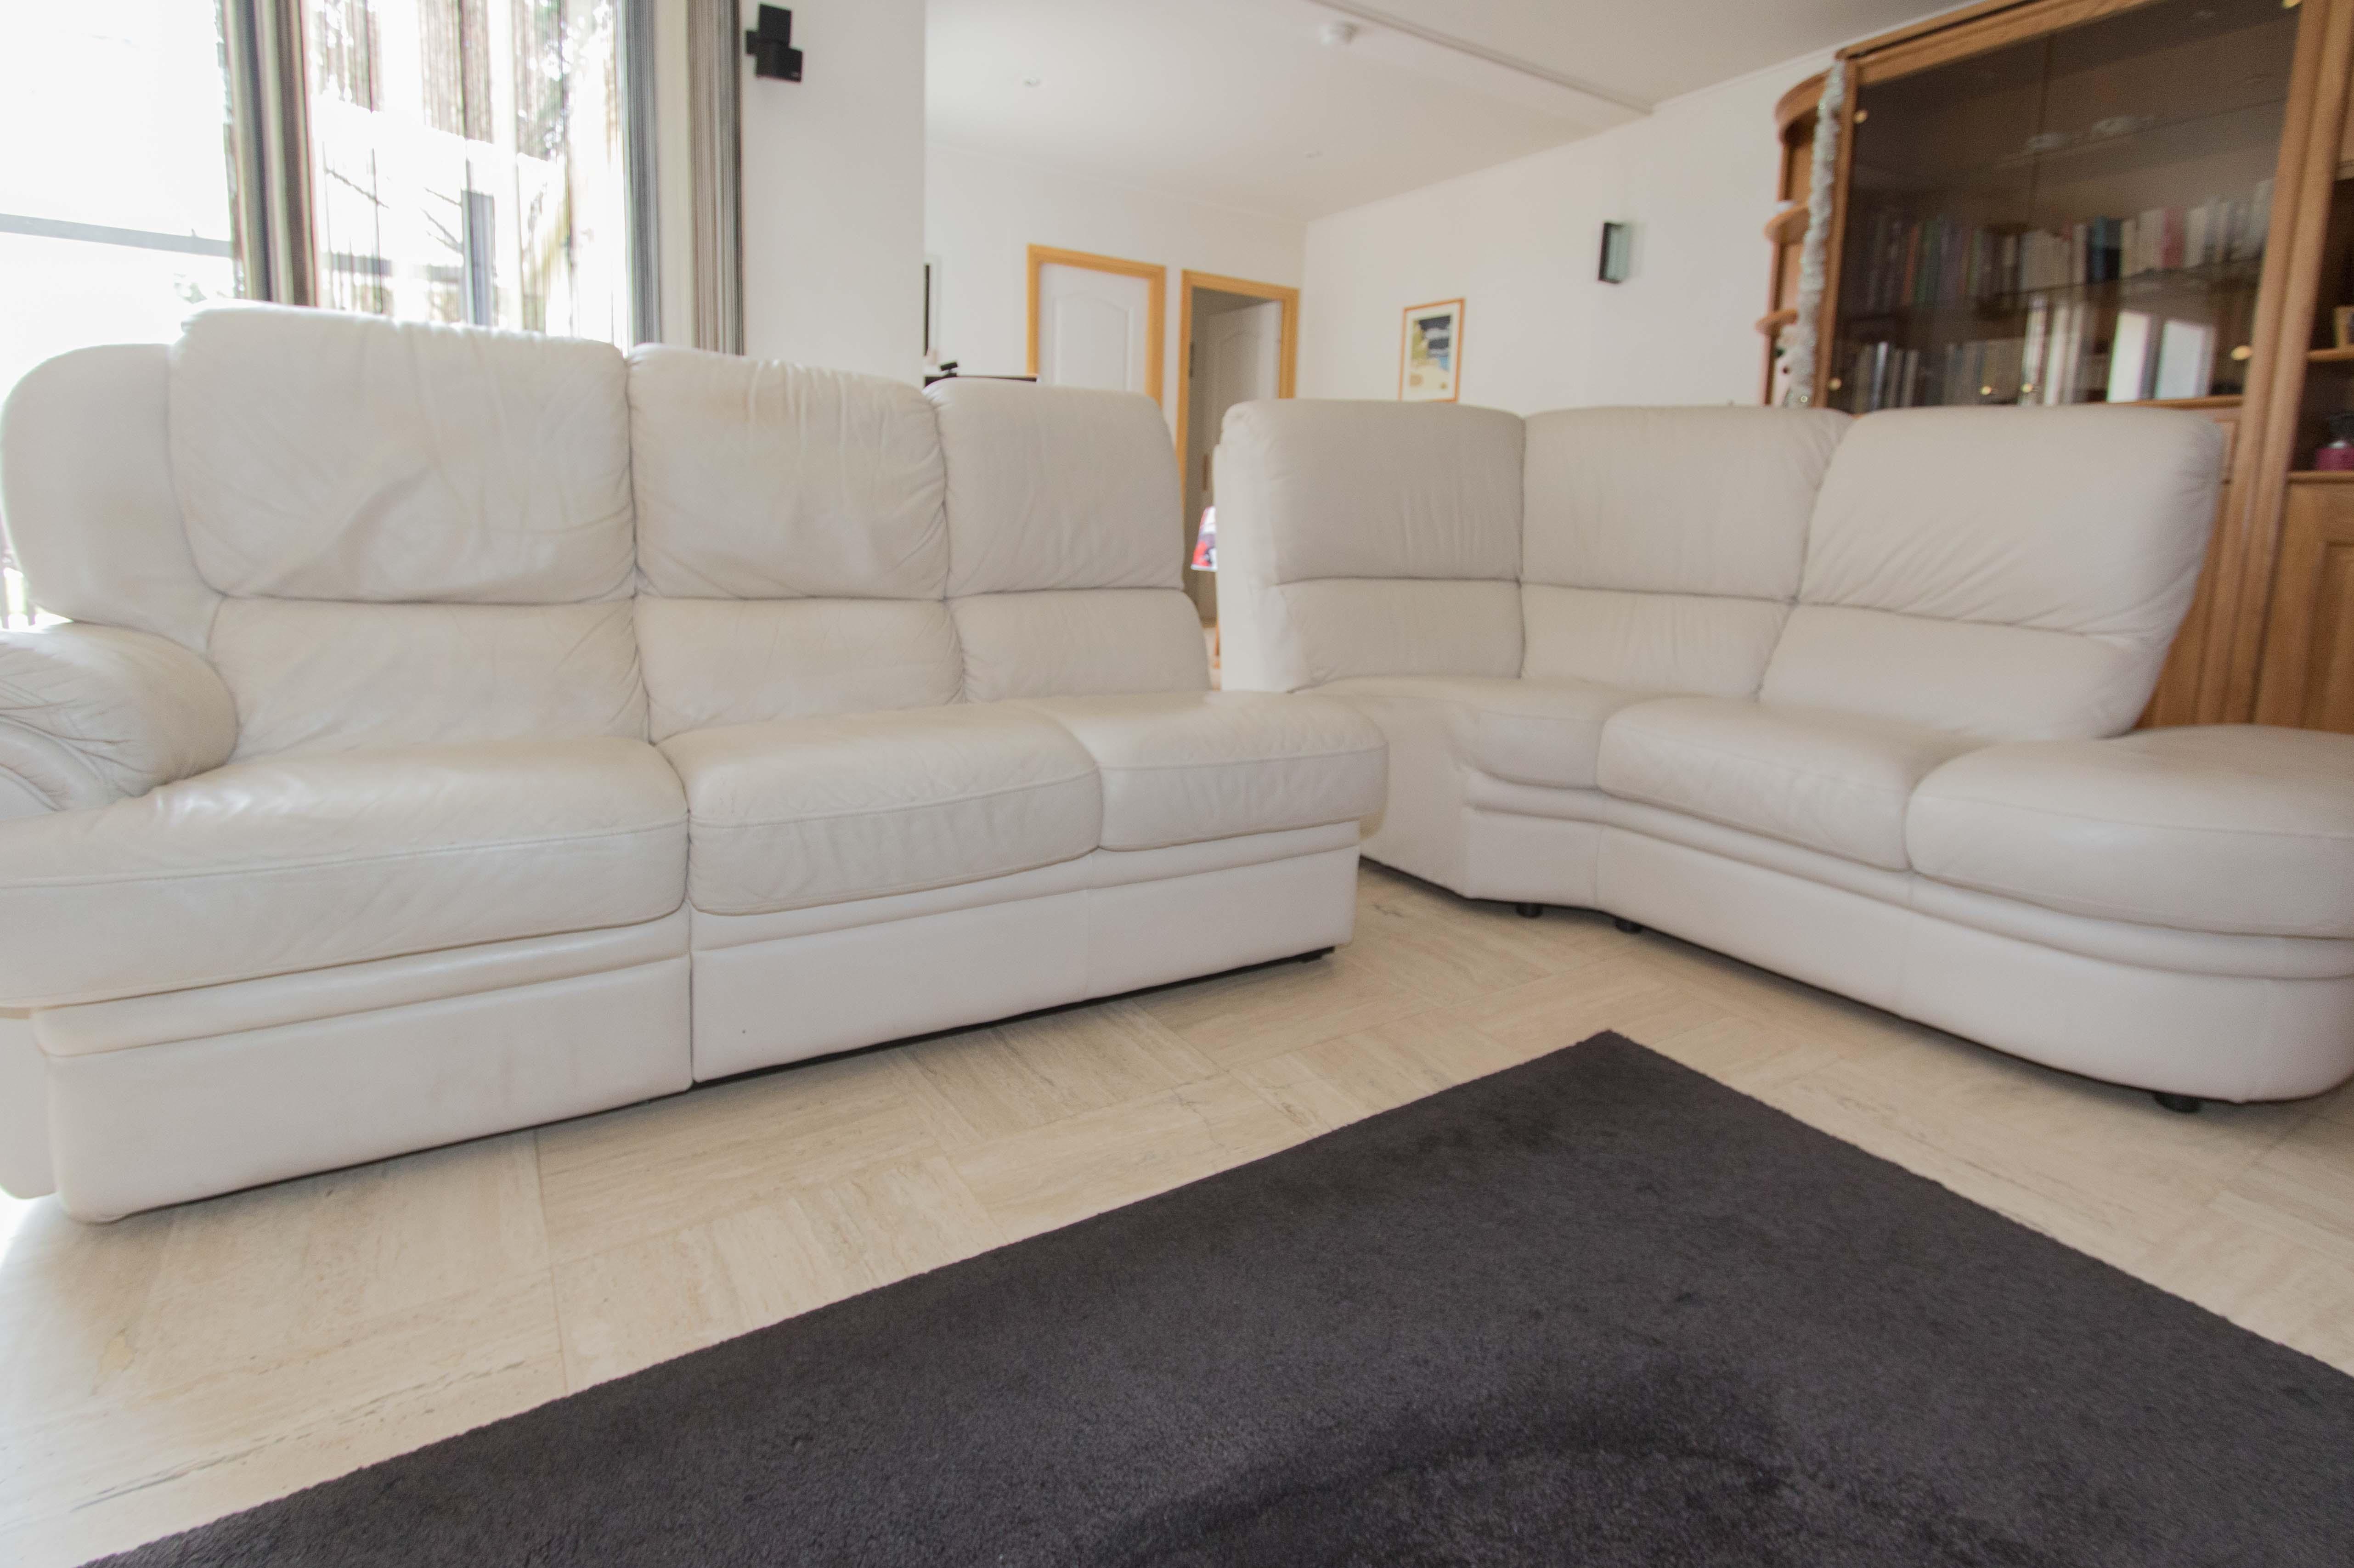 photo canape fauteuil. Black Bedroom Furniture Sets. Home Design Ideas